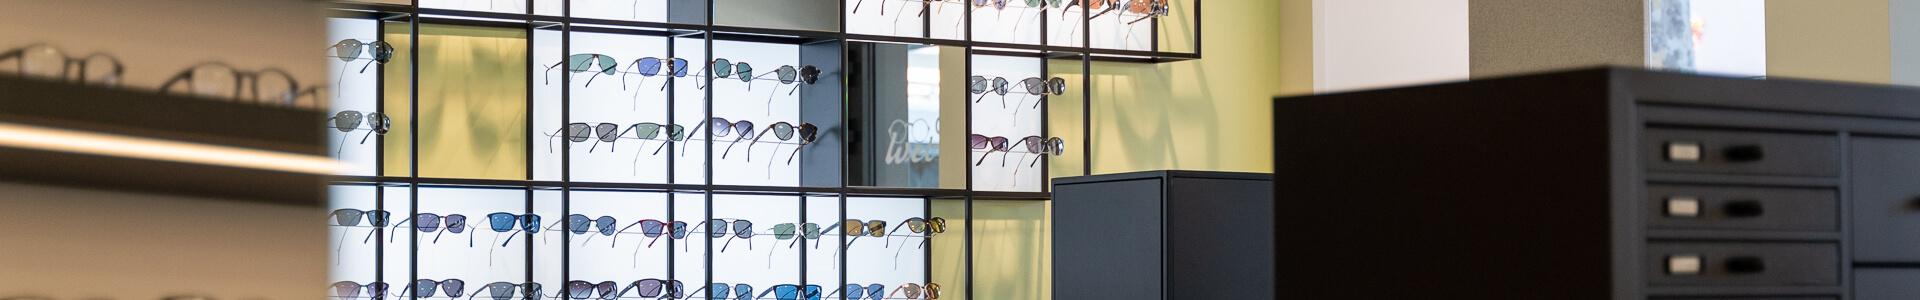 Optik Weber: Bietigheim – Buchzentrum